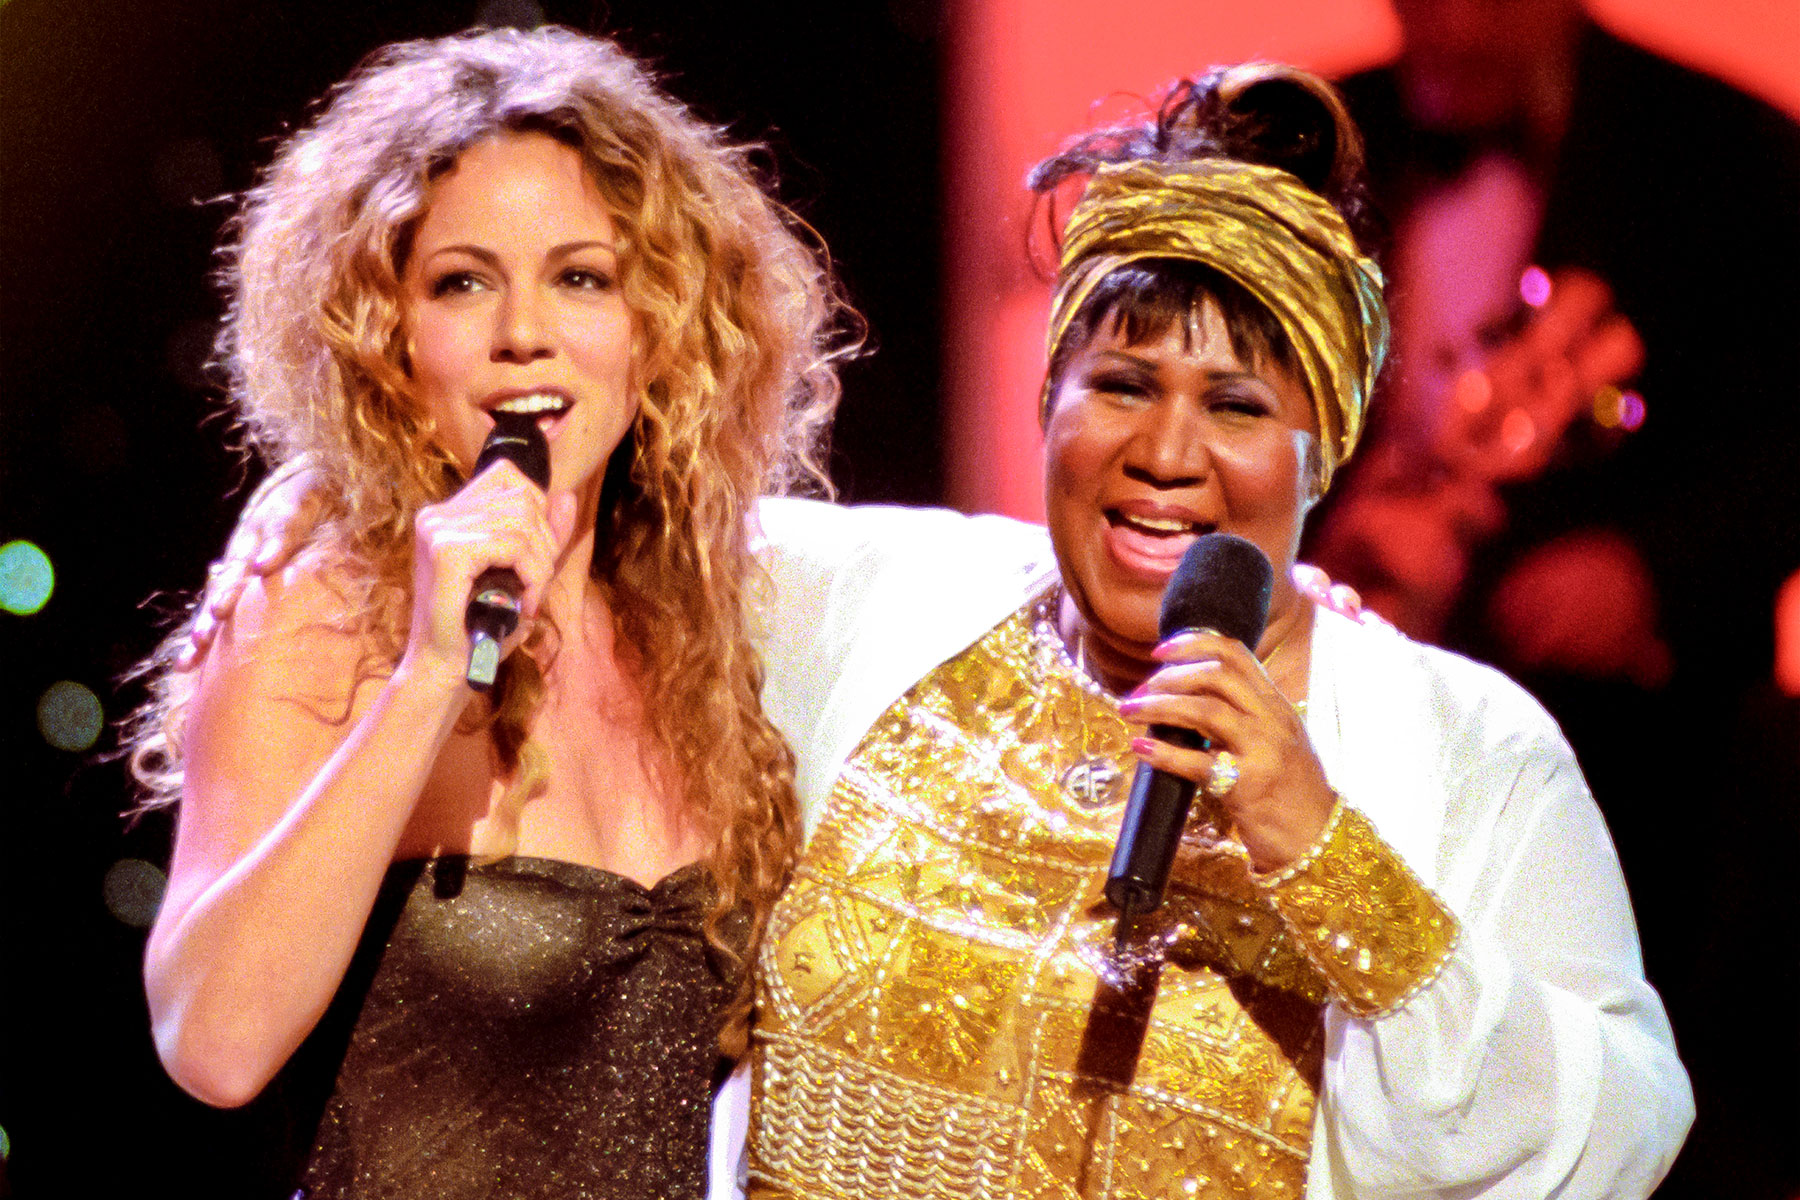 Mariah Carey on Aretha Franklin: My Inspiration, My Mentor, My